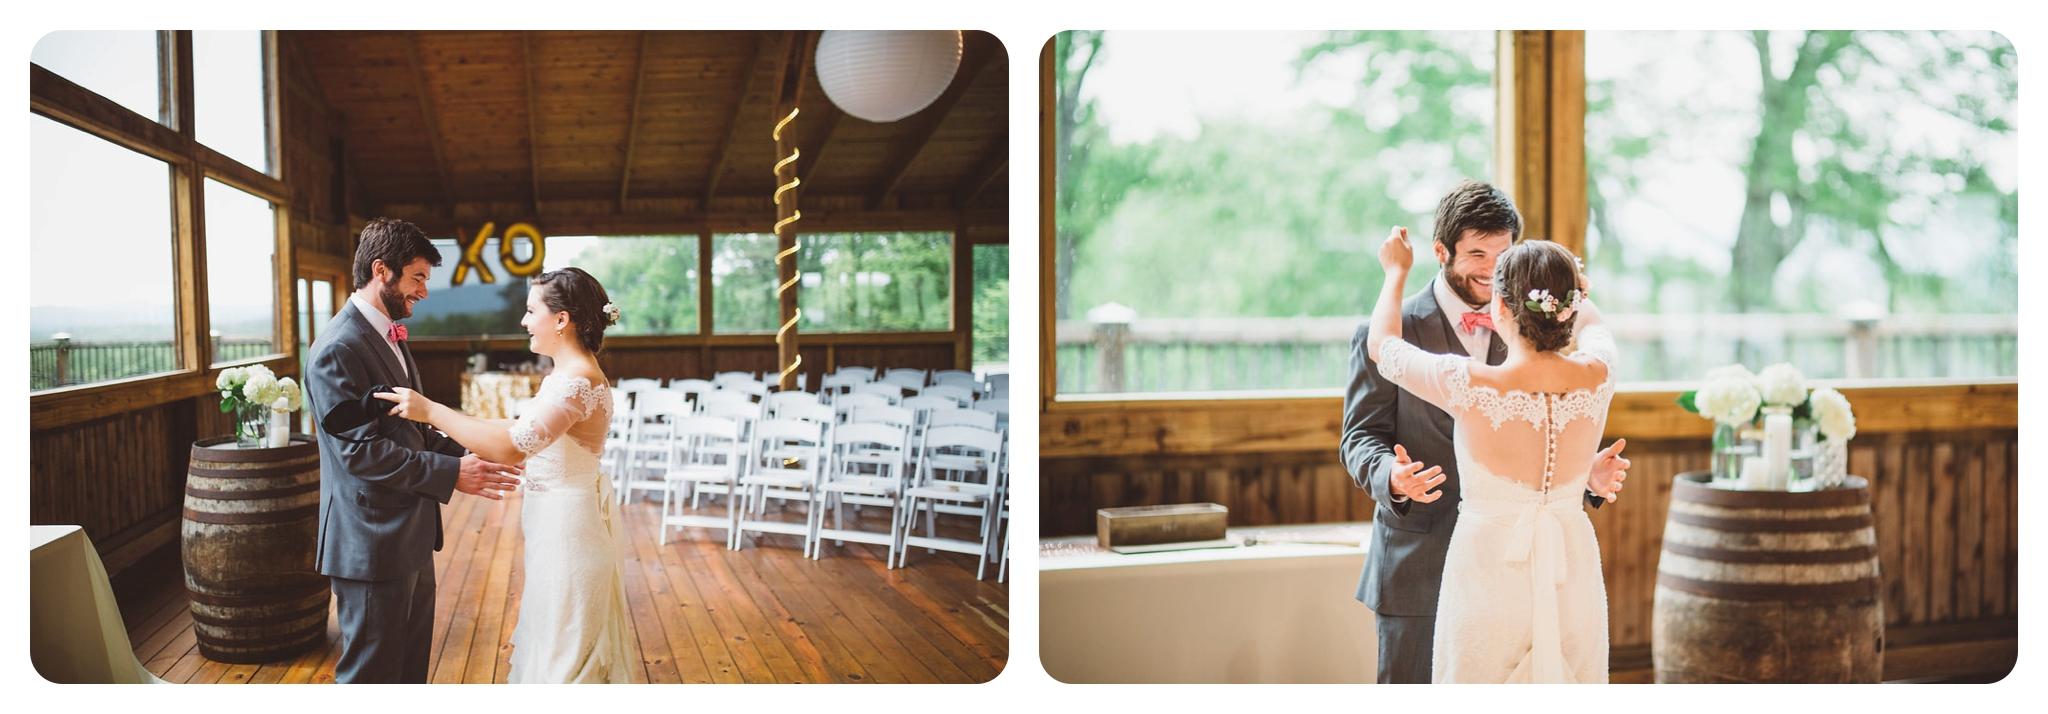 Braeloch-Weddings-Wedding-Photographer-Pat-Cori-Photography-012.jpg